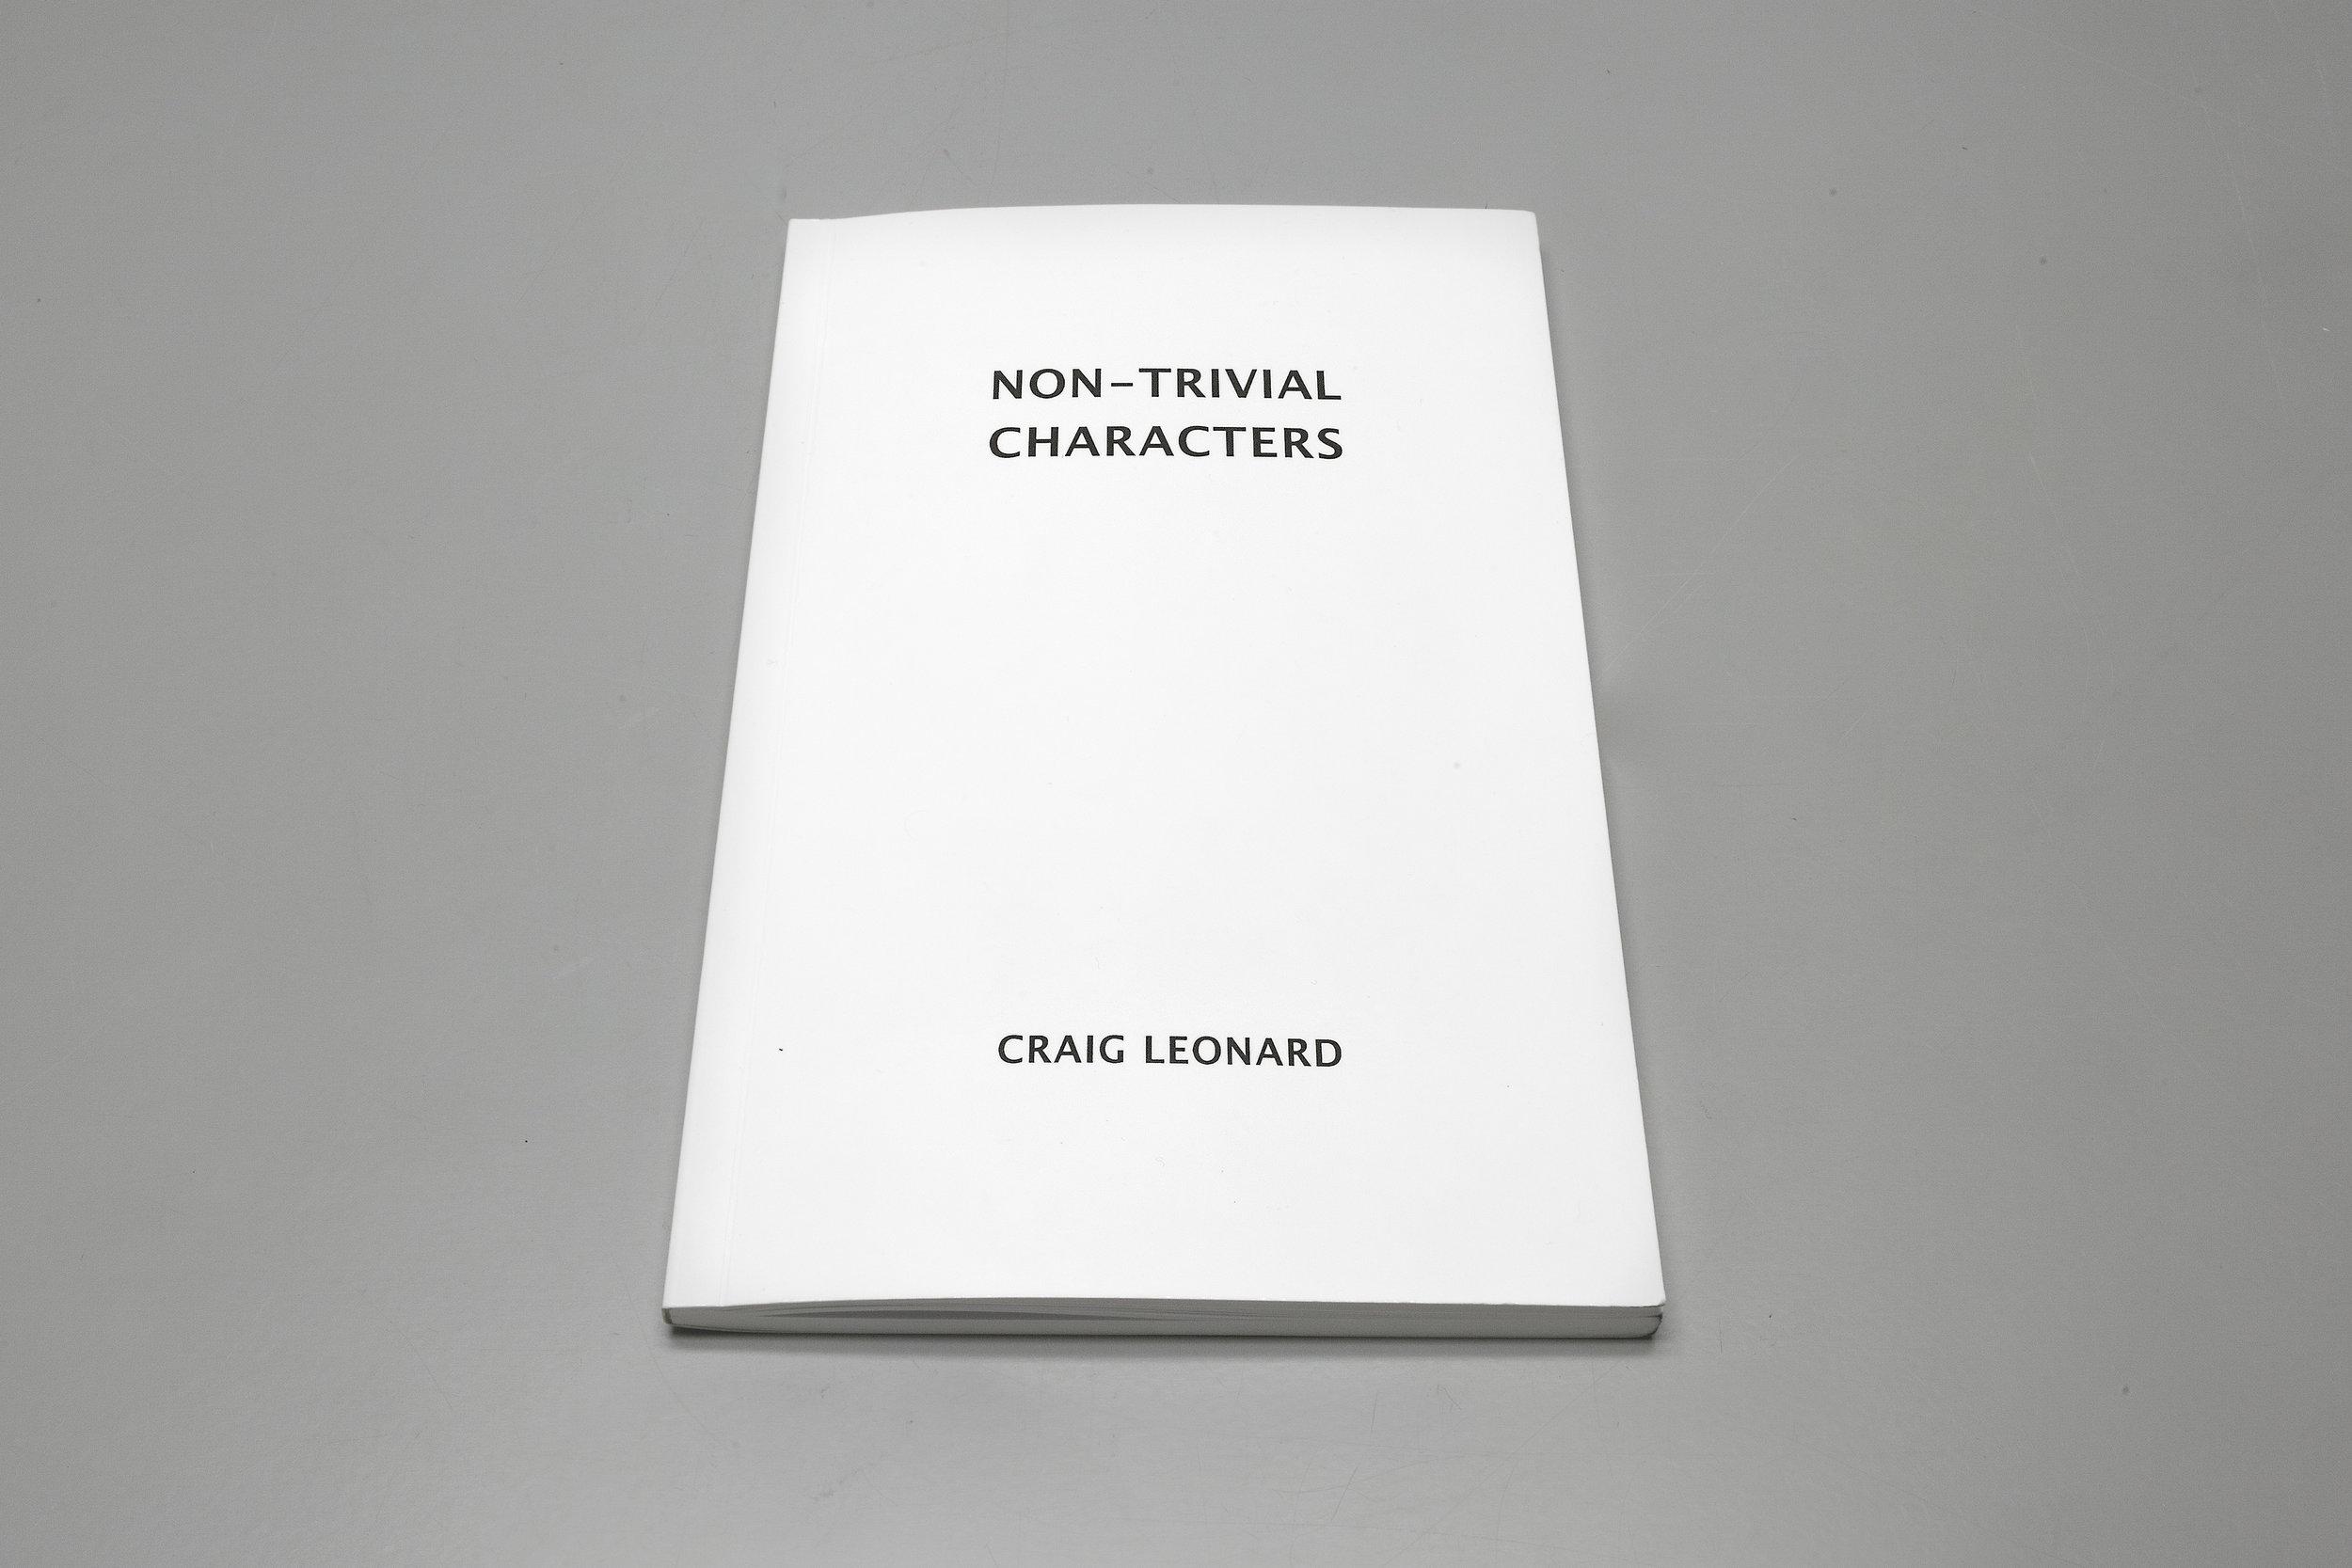 ED002: Craig Leonard - Non-Trivial Characters (Cover)